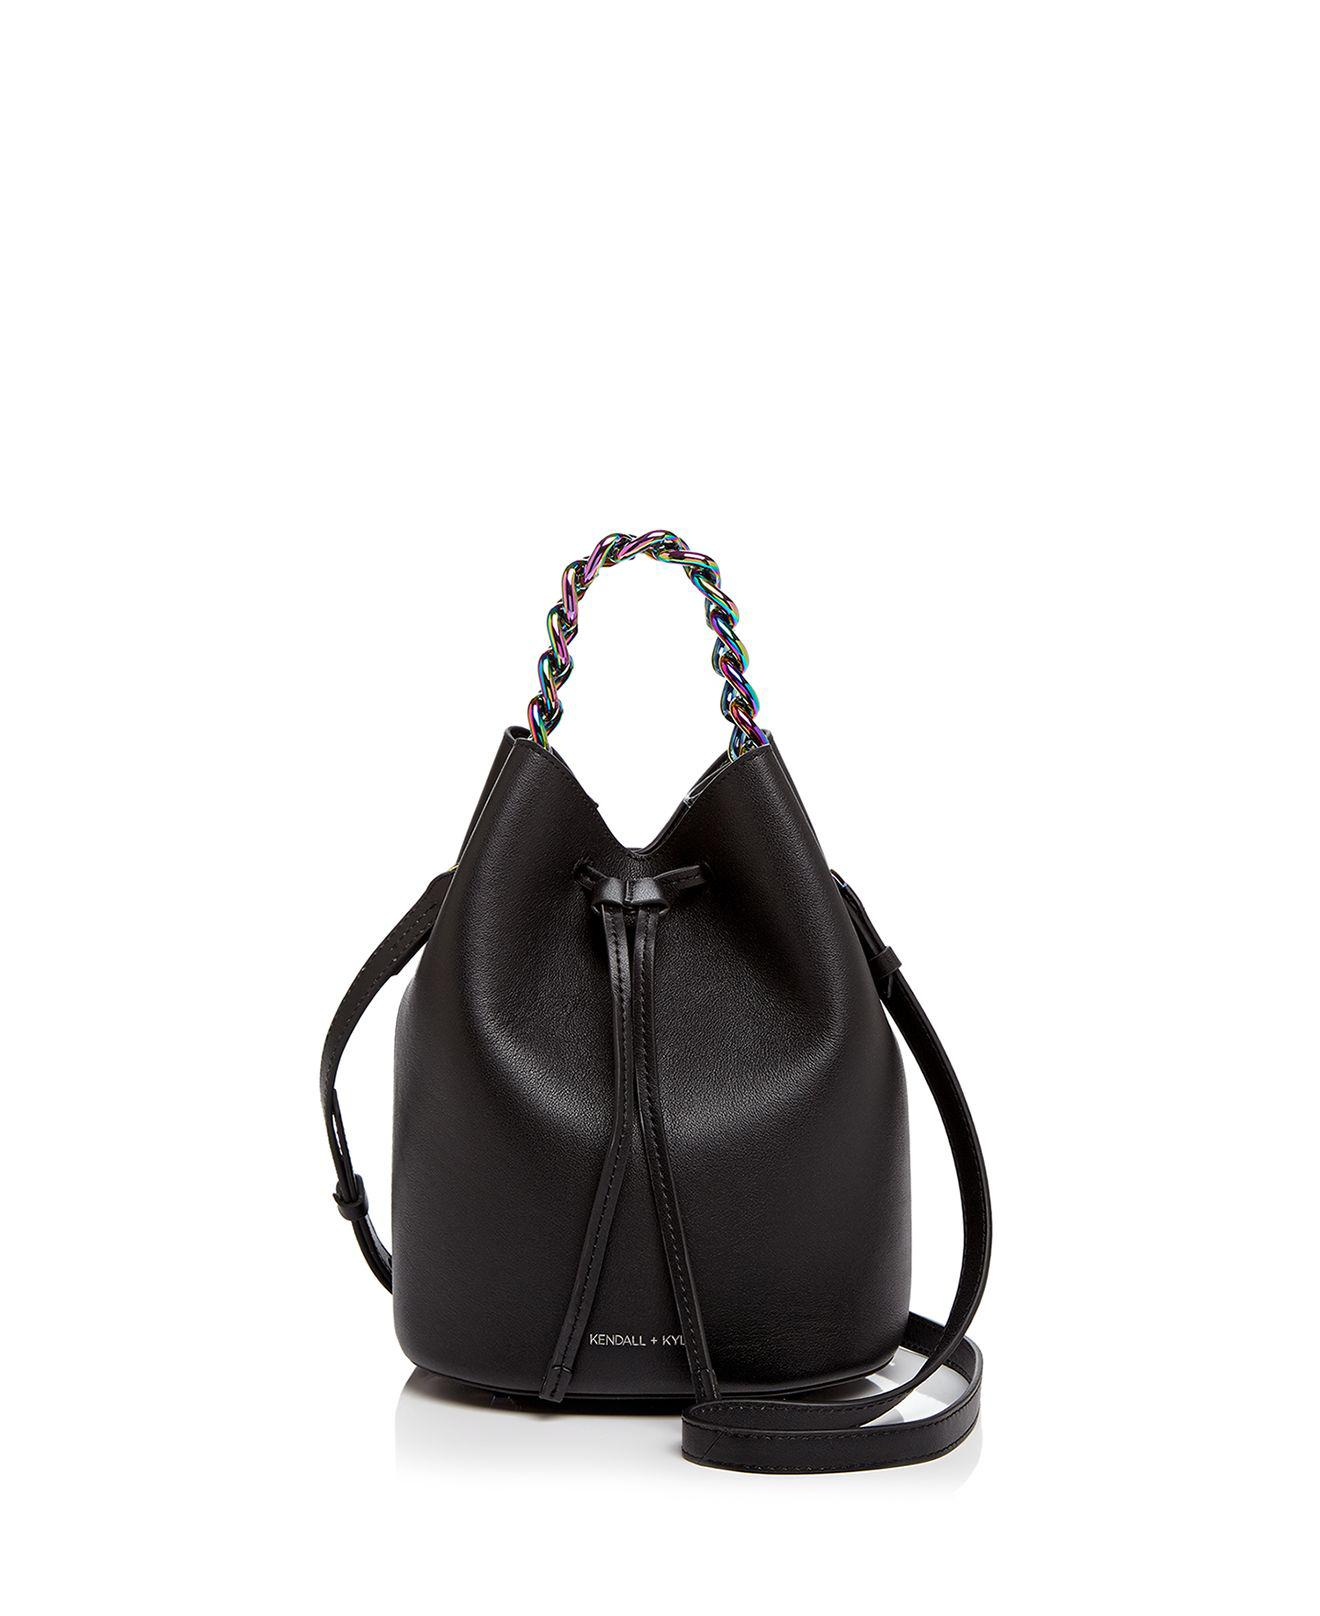 Kendall + Kylie Black satin bucket bag QV1LRECFNC